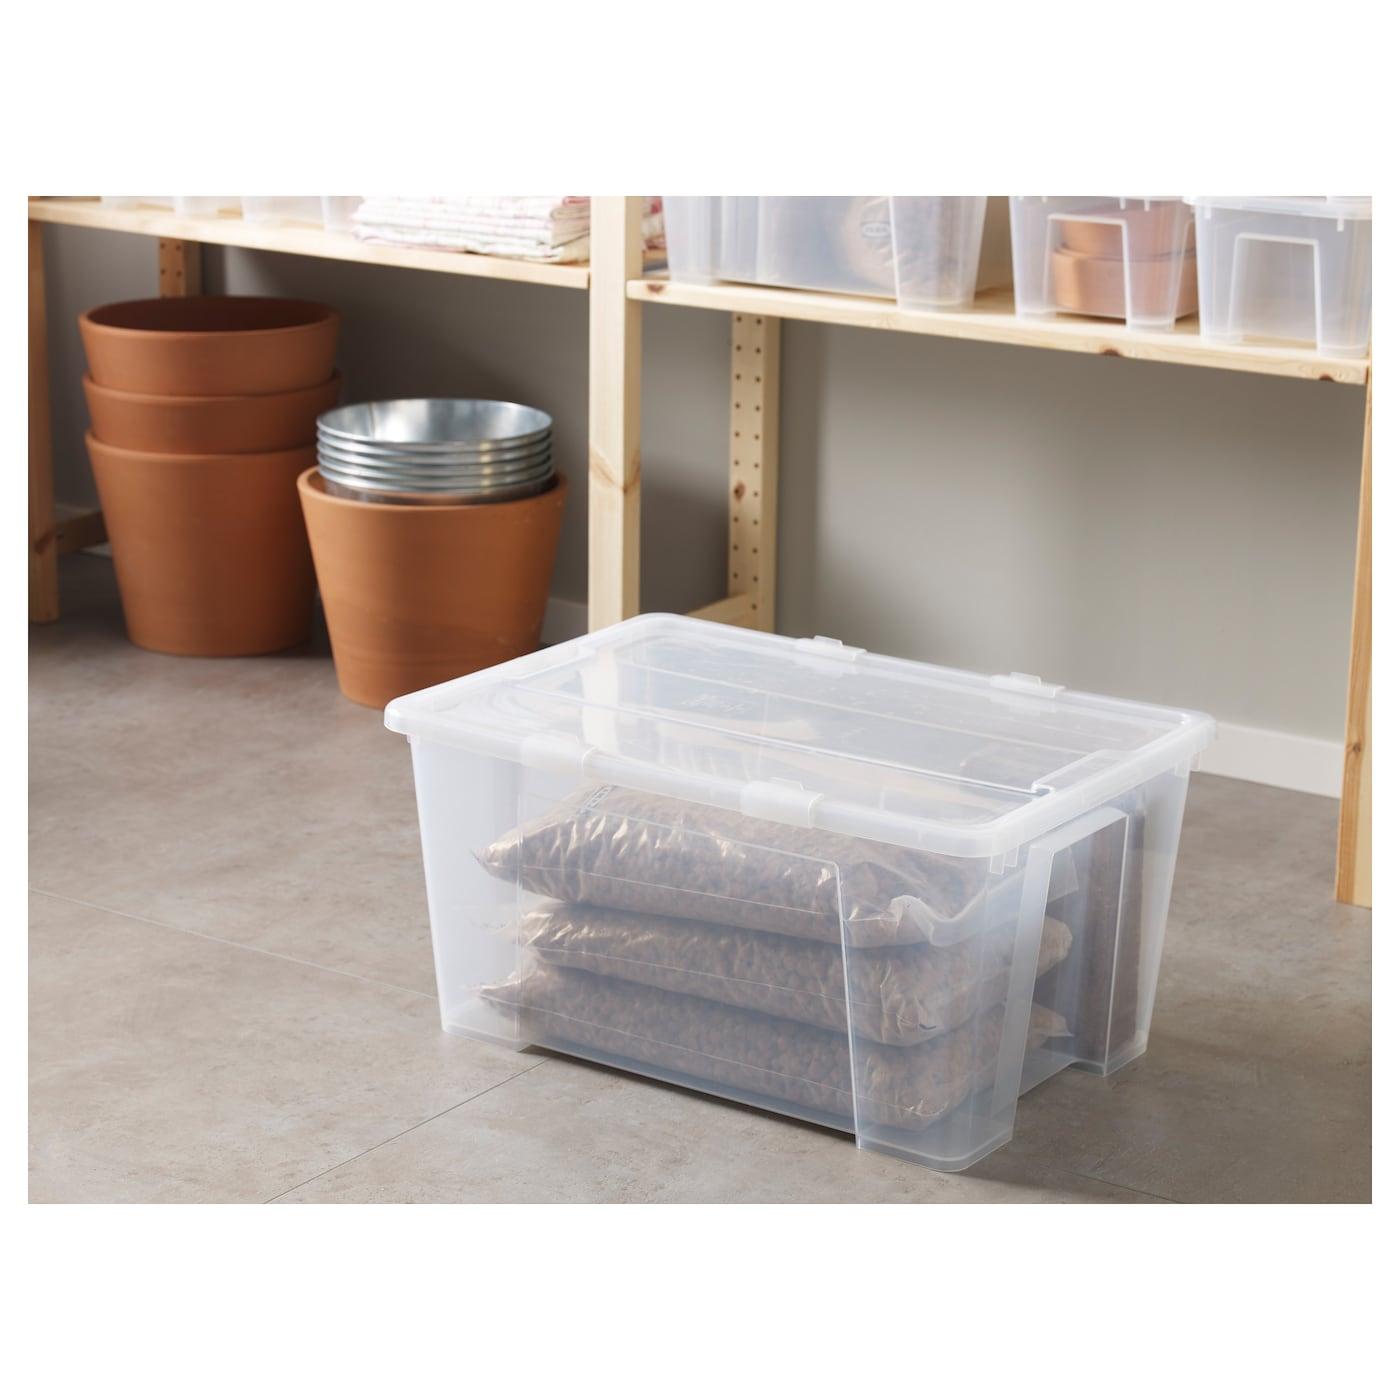 SAMLA Låda med lock, transparent, 57x39x28 cm/45 l